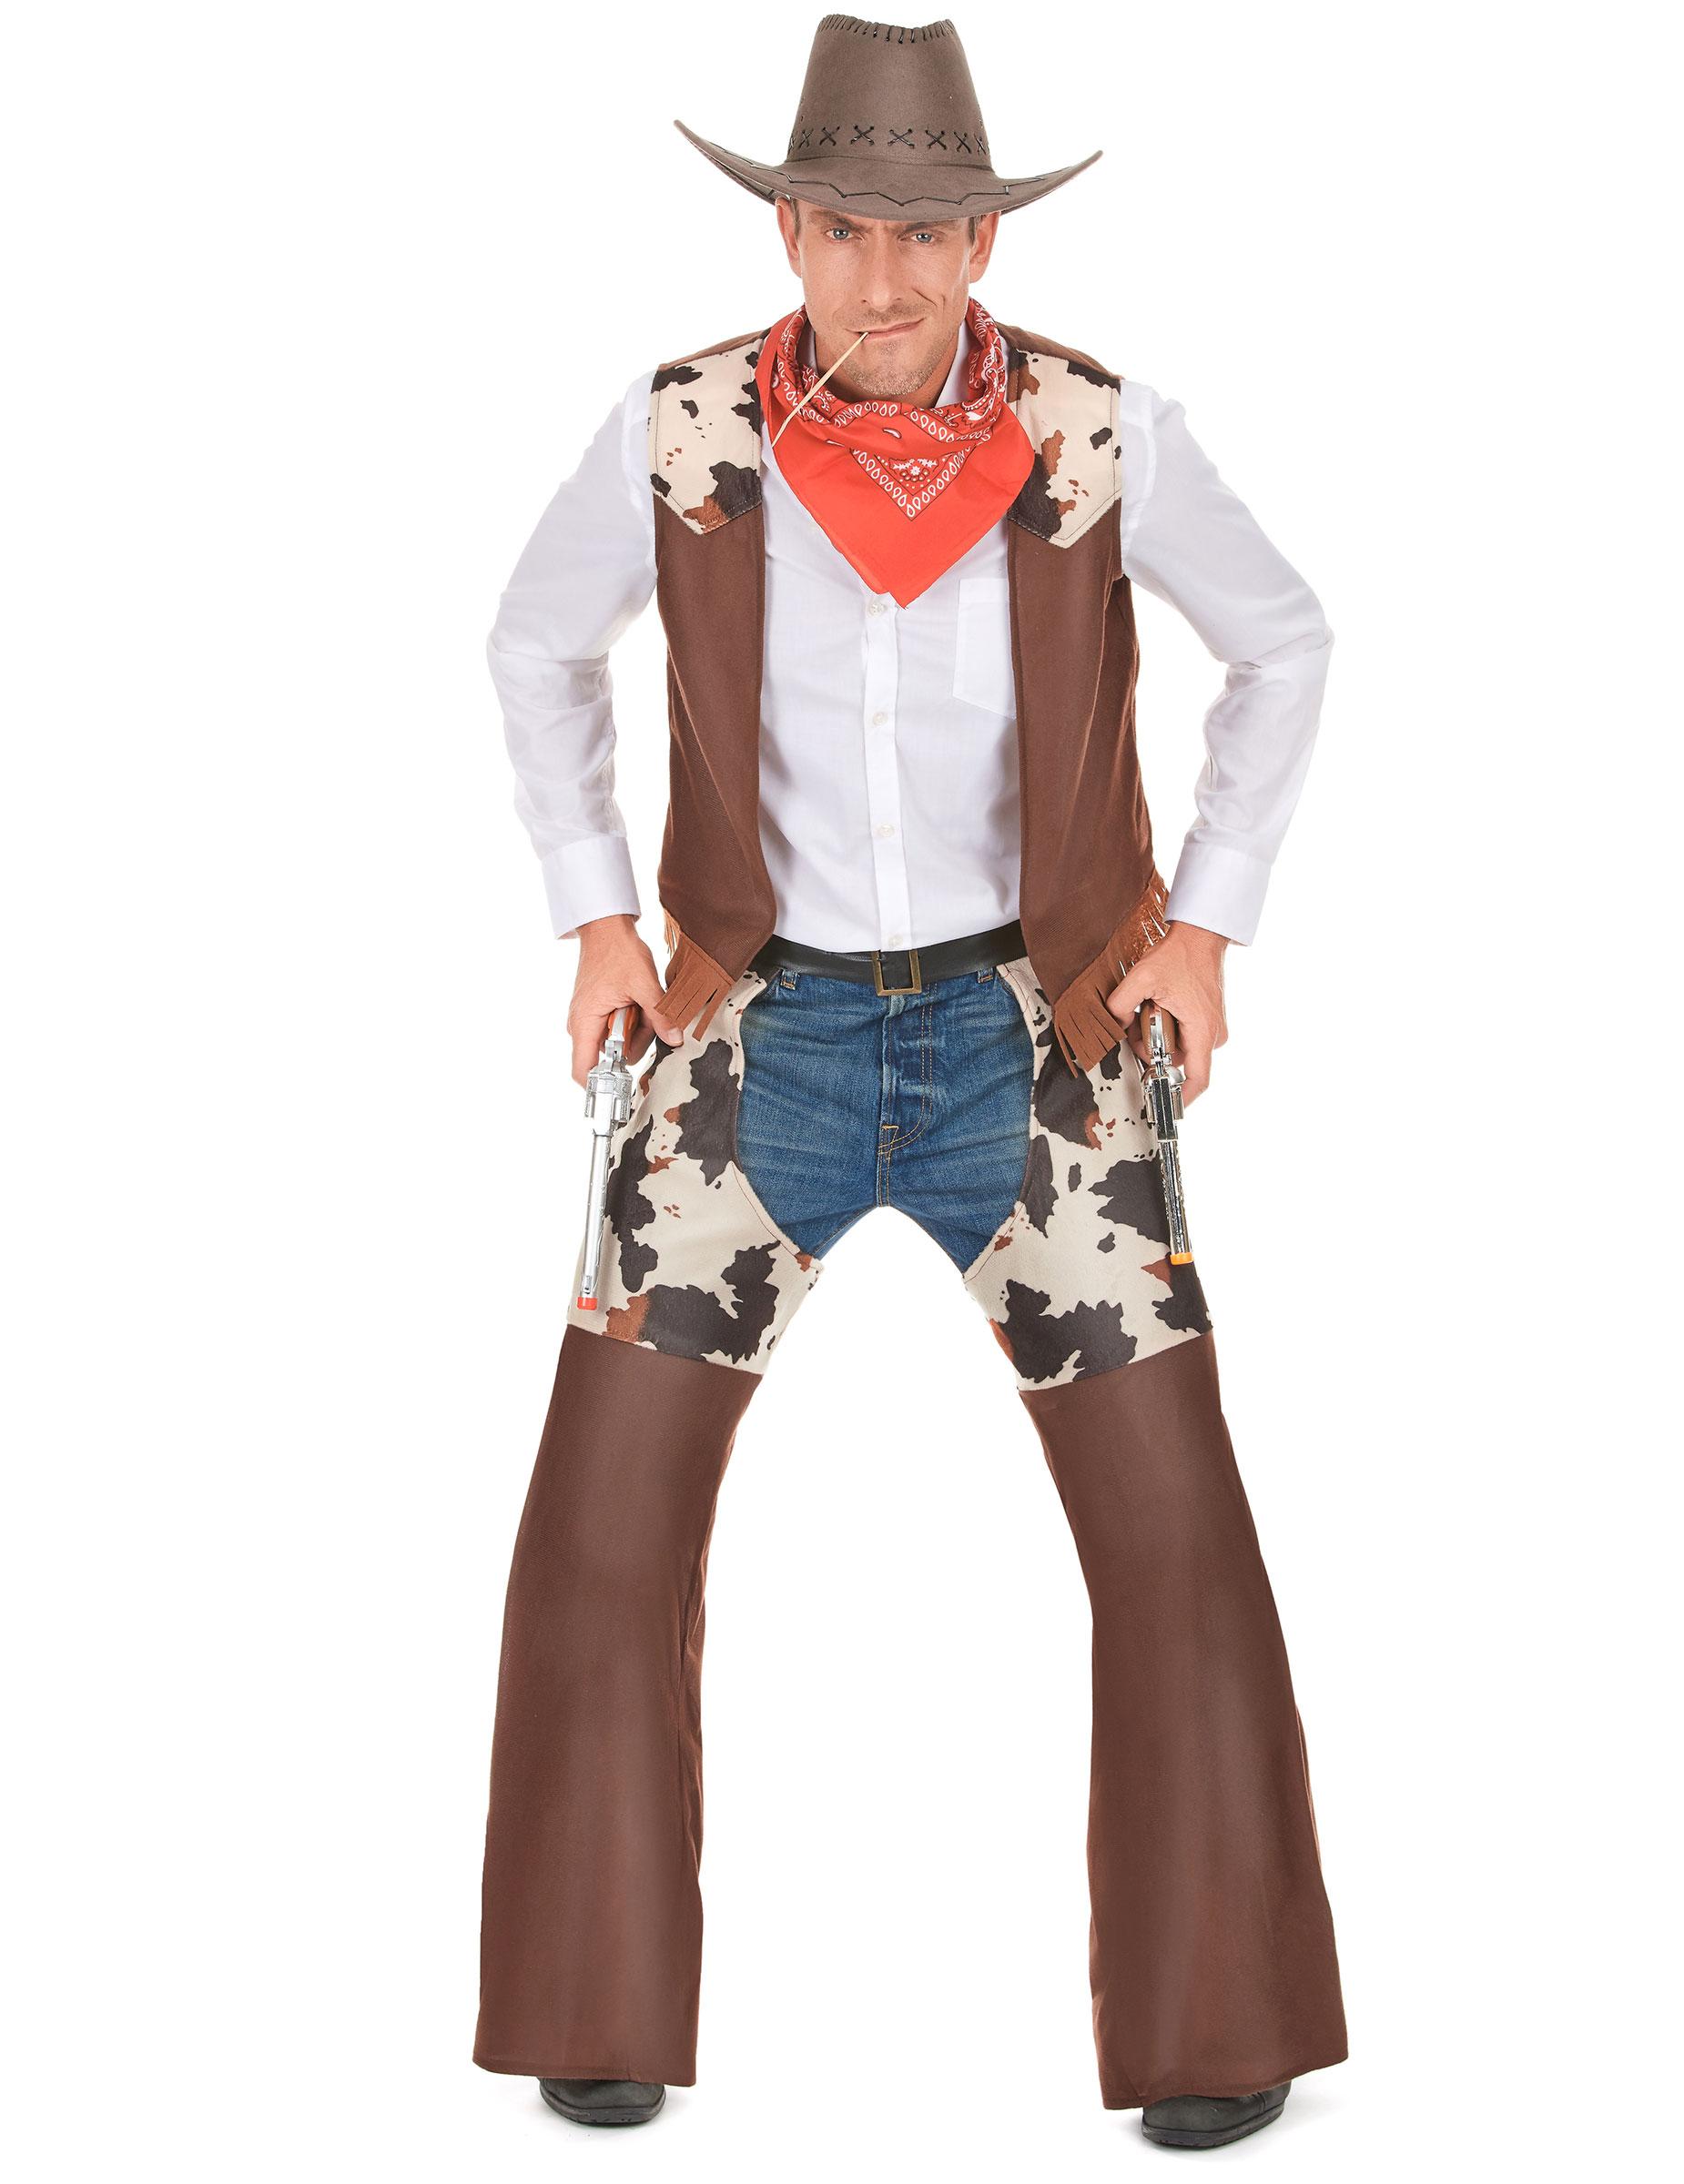 costume cowboy adulto costumi adulti e vestiti di carnevale online vegaoo. Black Bedroom Furniture Sets. Home Design Ideas